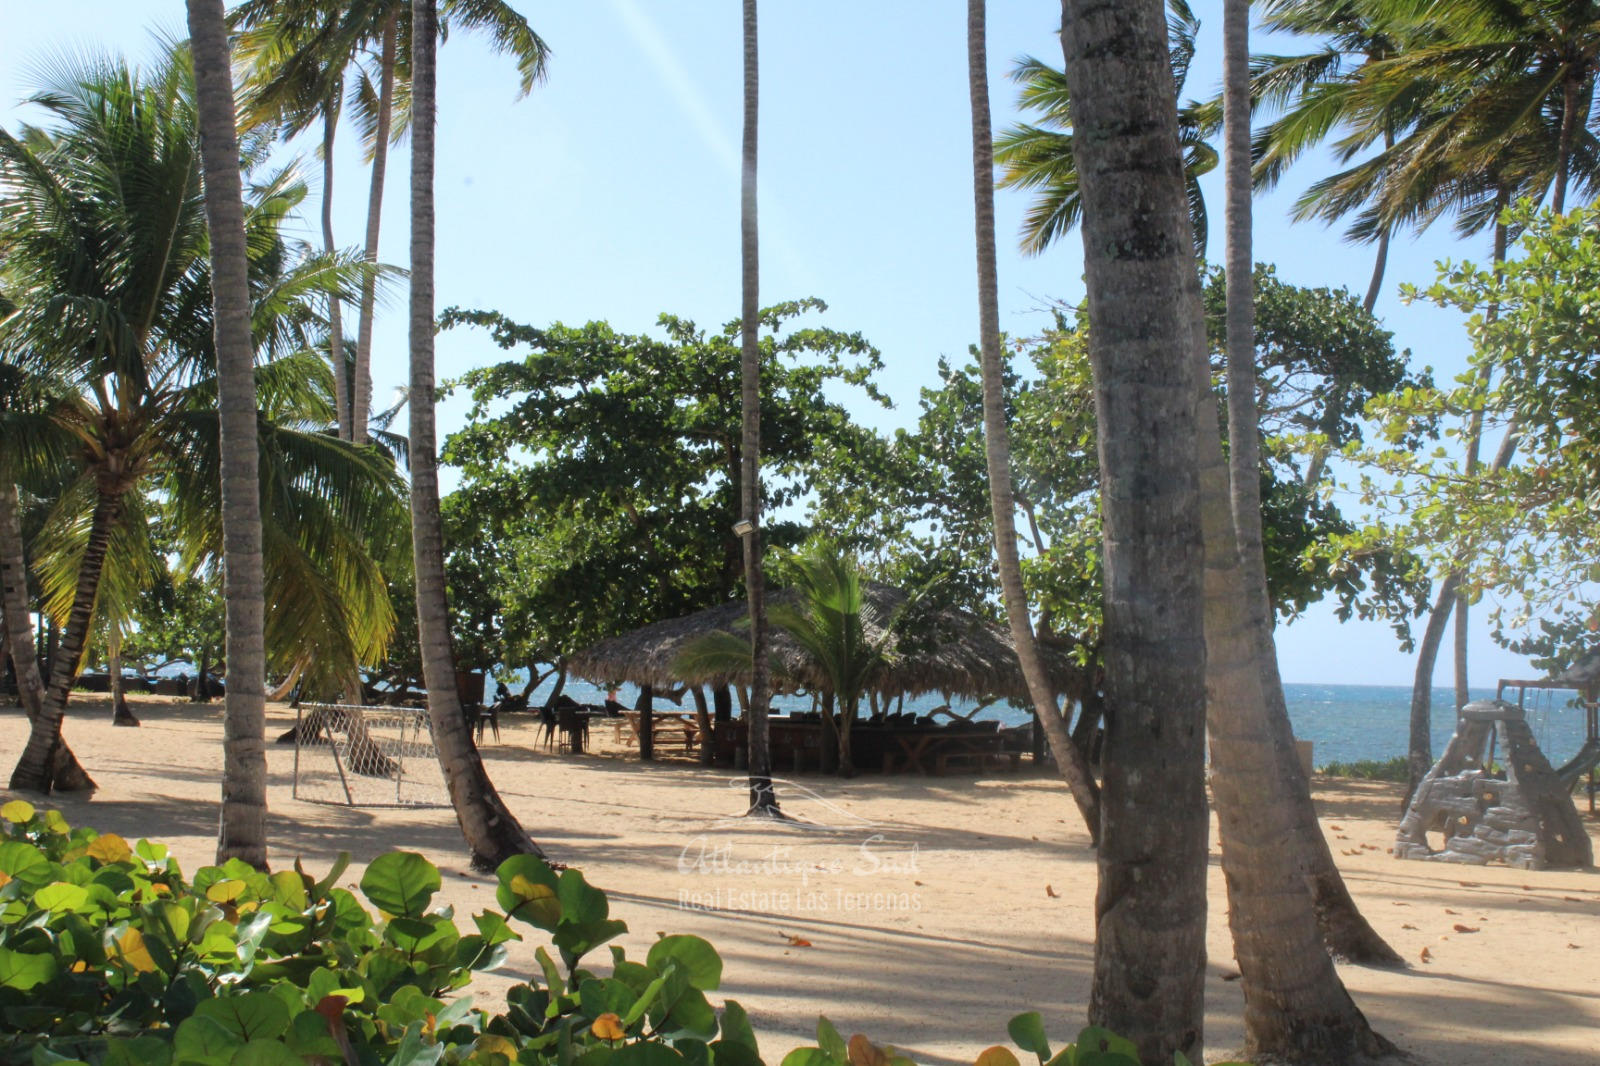 Apartments near the beach real estate las terrenas dominican republic58.jpg